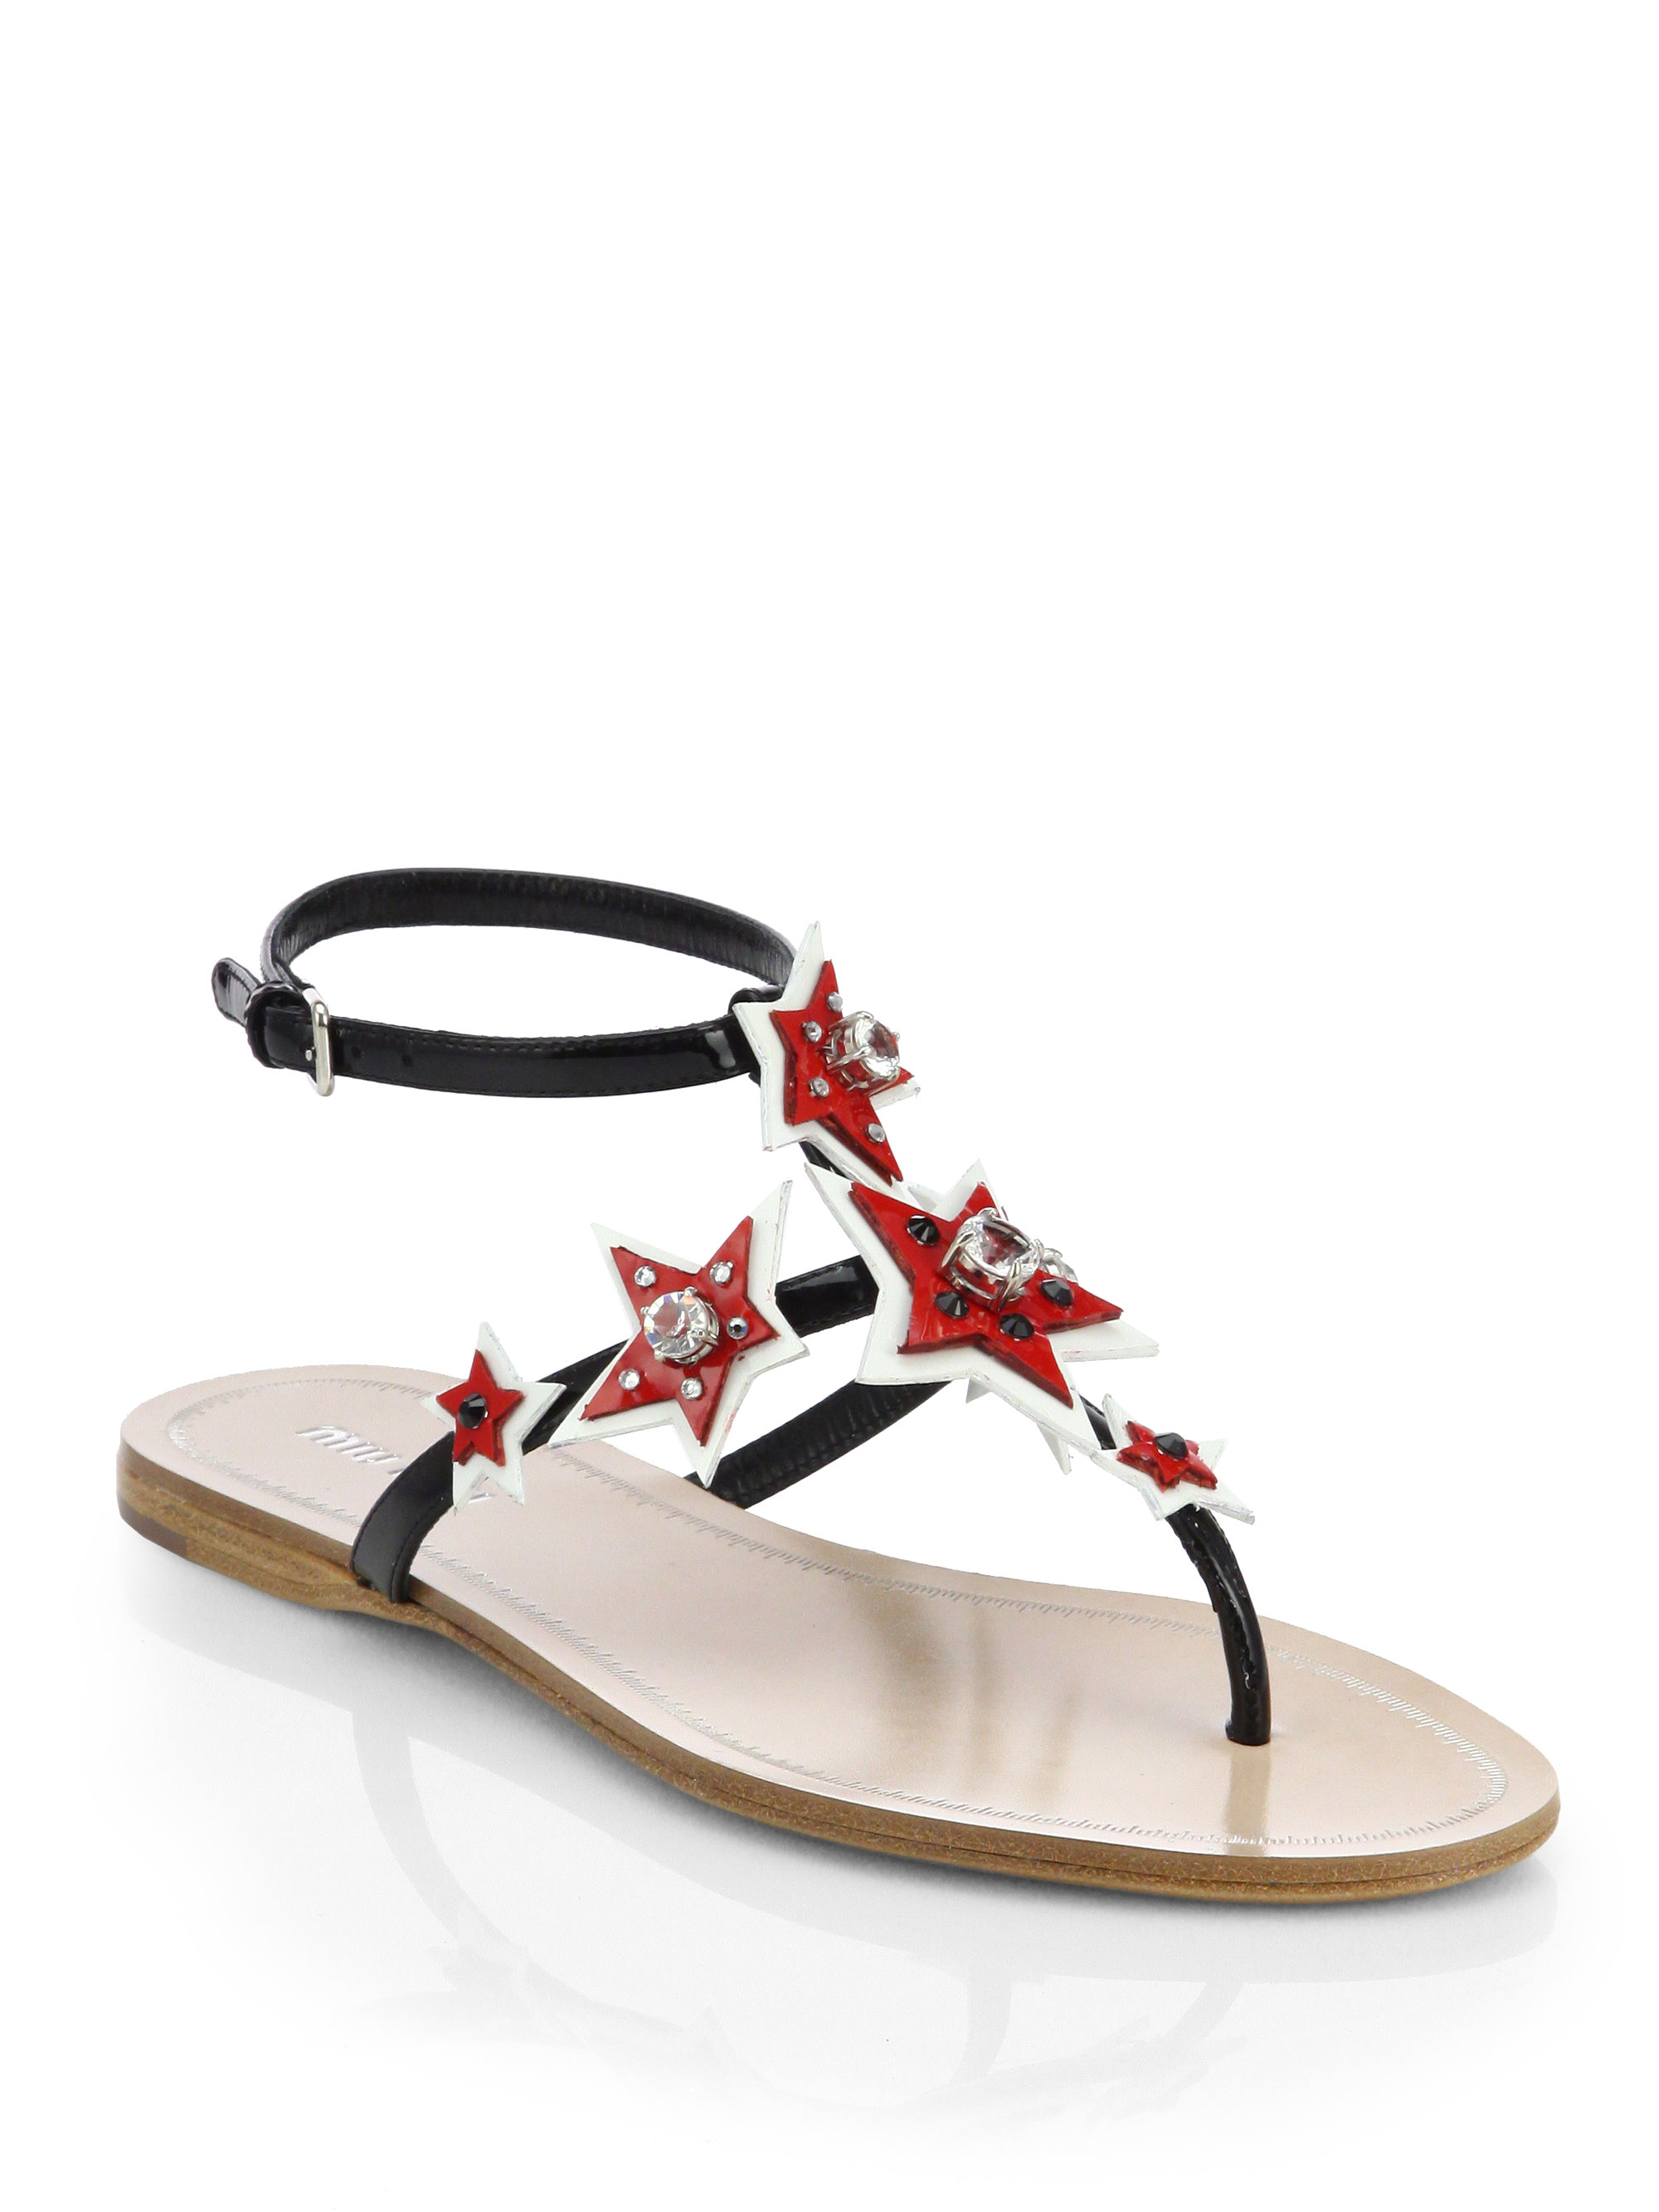 Miu Miu Star Jeweled Patent Leather Thong Sandals In Black